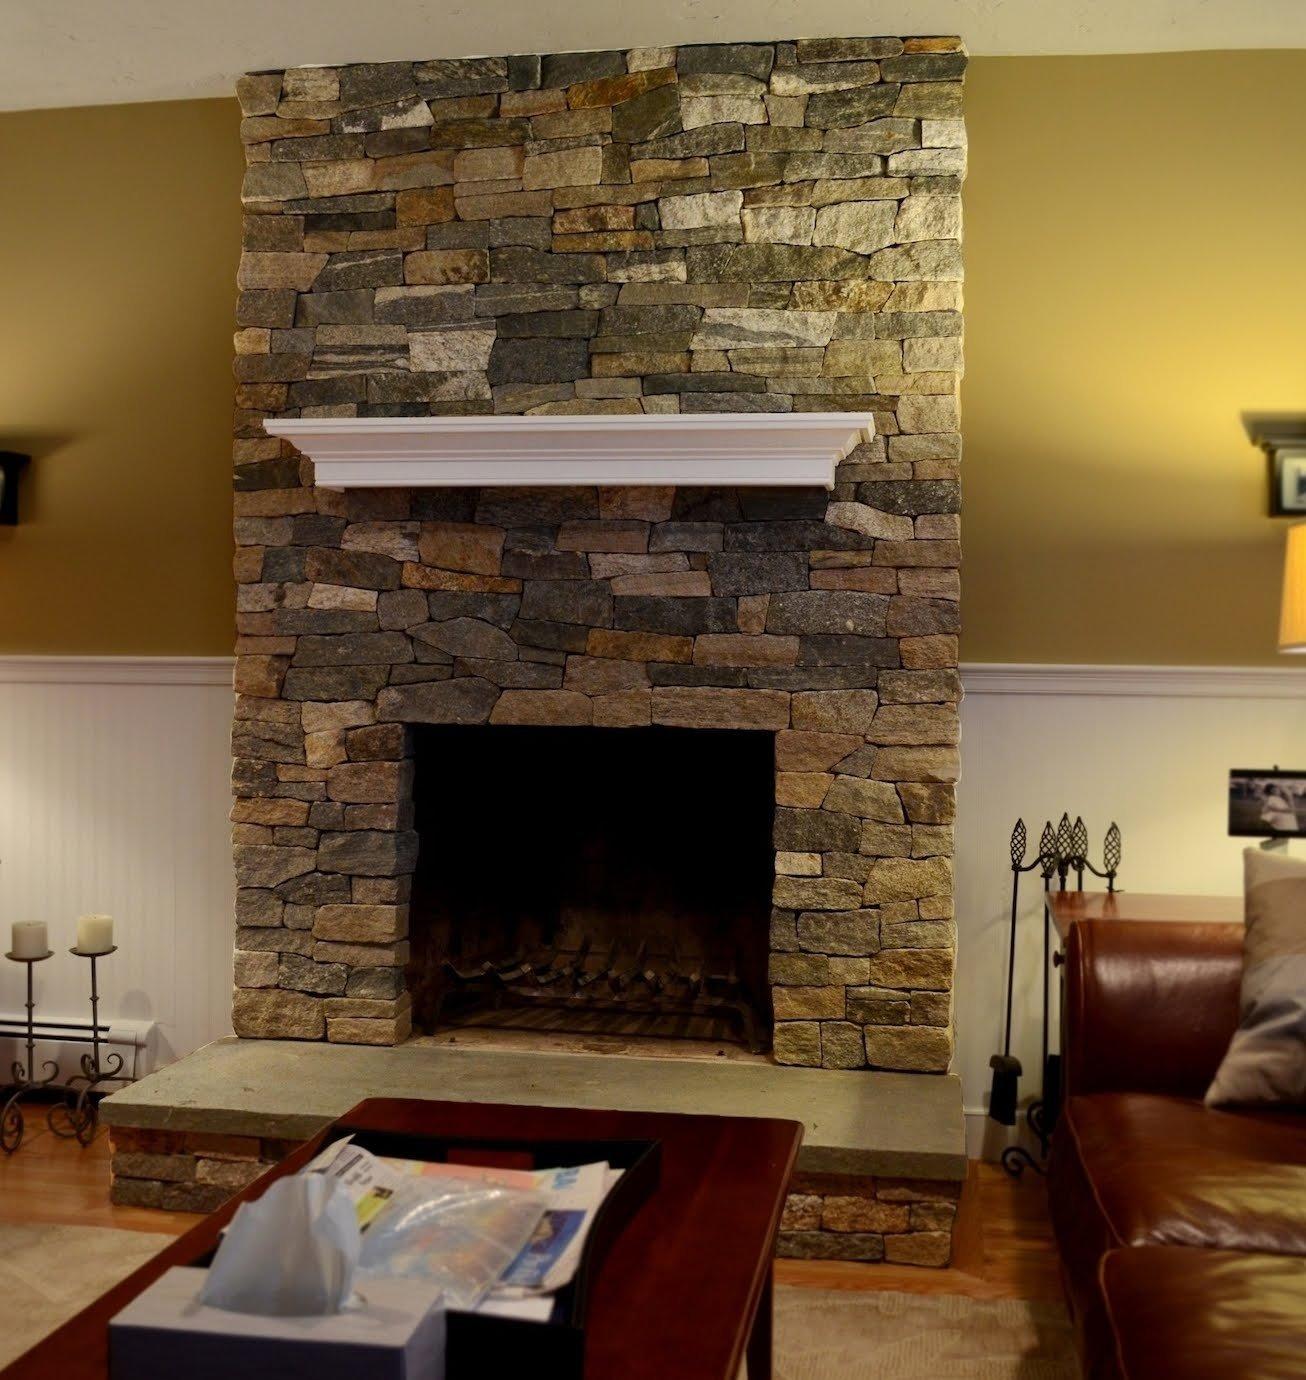 10 Unique Fireplace Design Ideas With Tile fireplace tile ideas youtube 2021